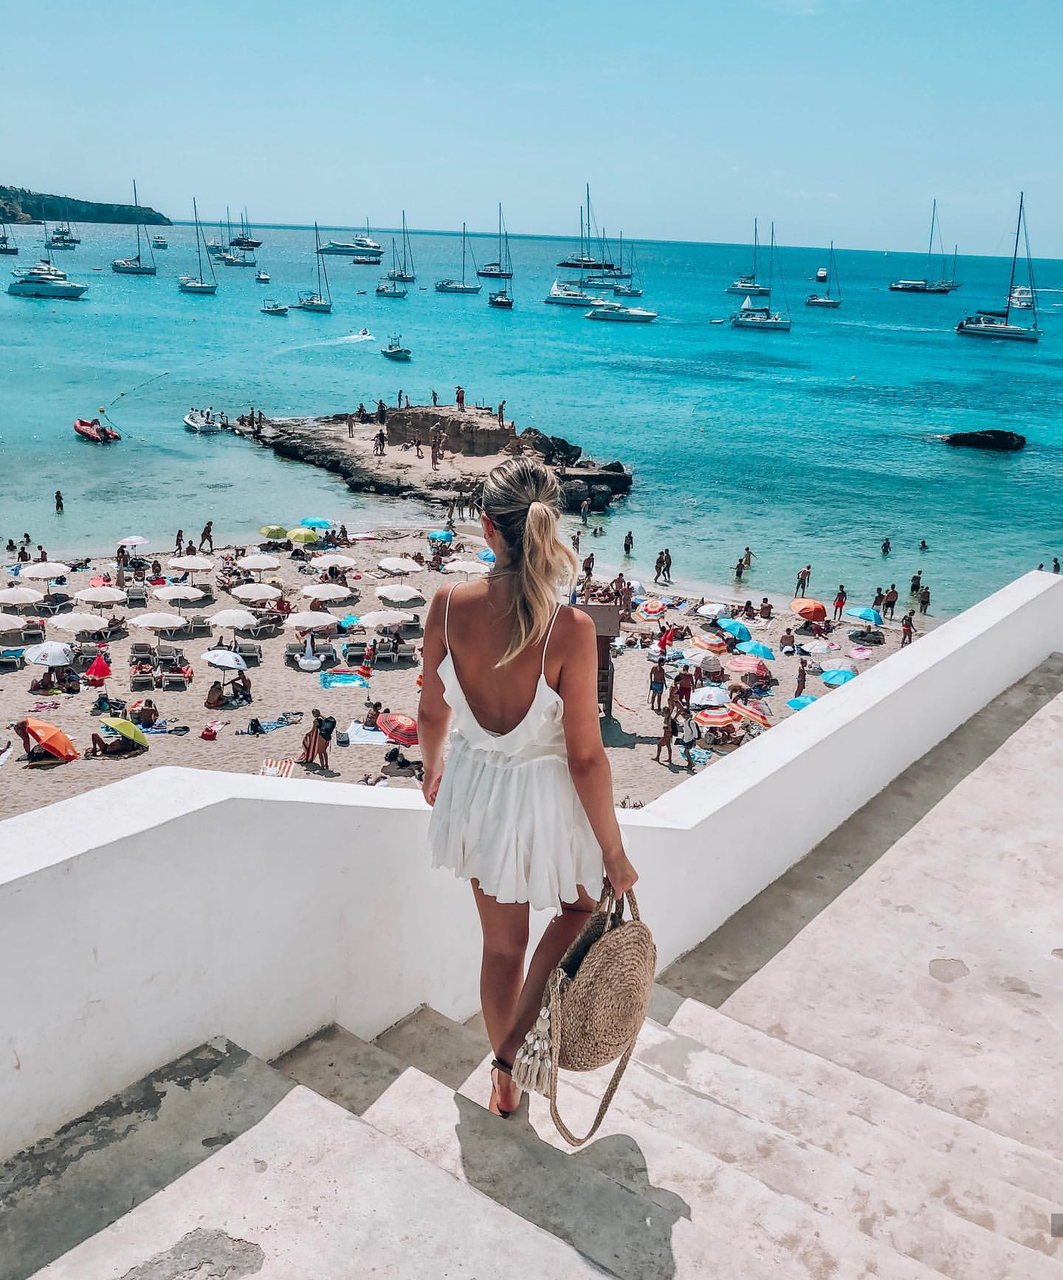 Ibiza Fashion In 2020 Ibiza Travel Ibiza Beaches Girls Ibiza Fashion